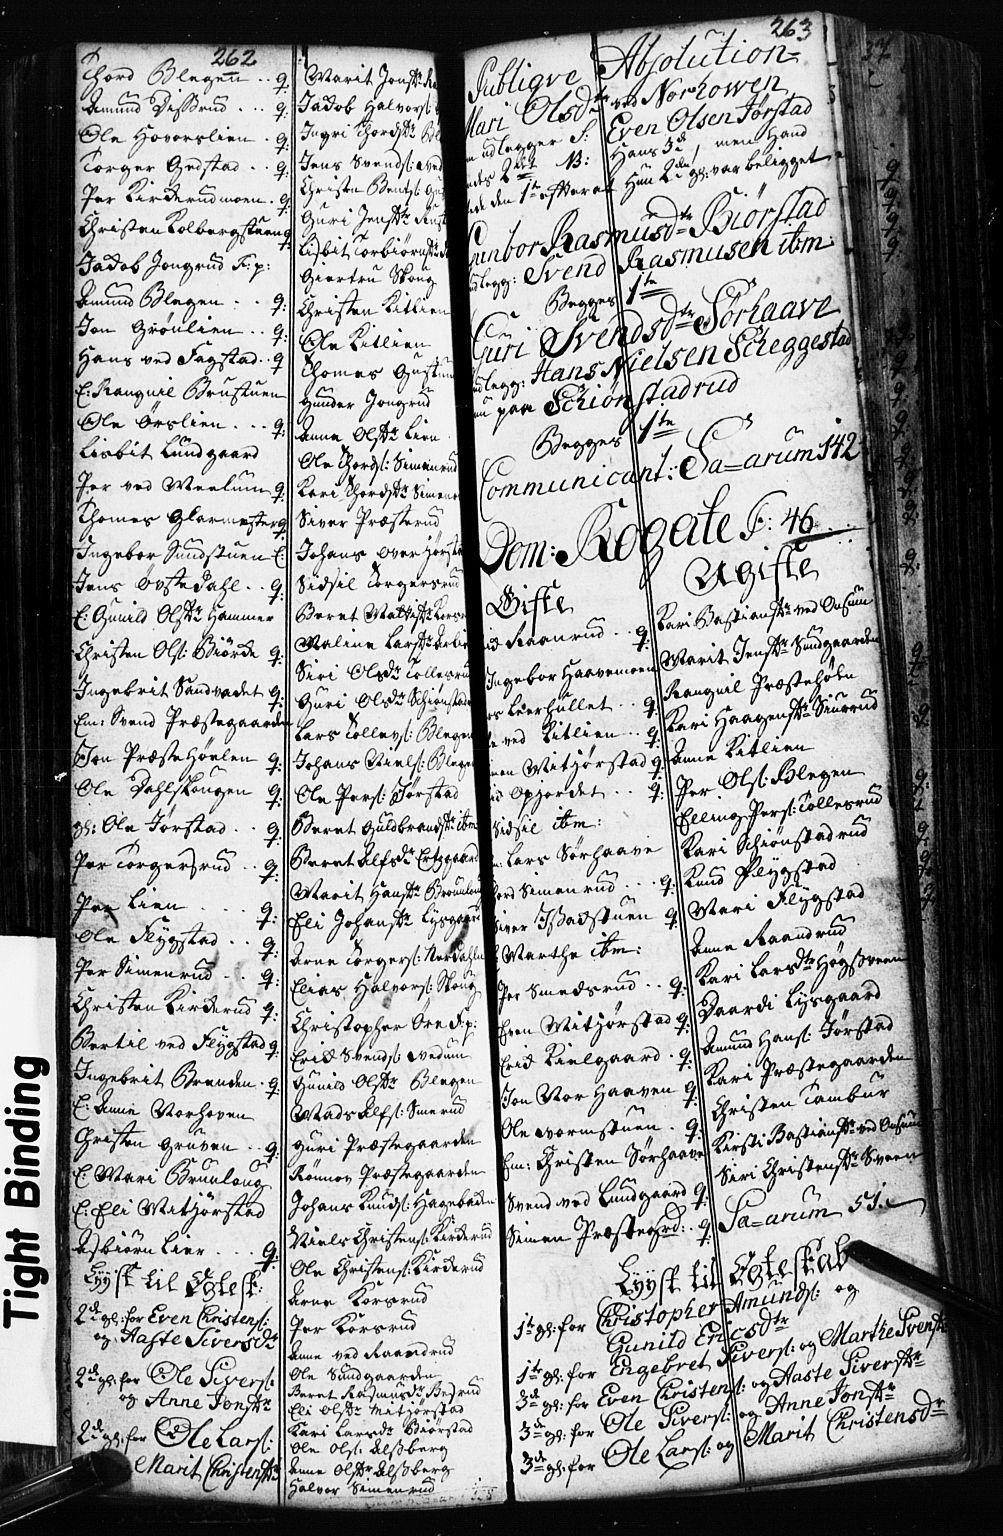 SAH, Fåberg prestekontor, Klokkerbok nr. 2, 1741-1756, s. 262-263